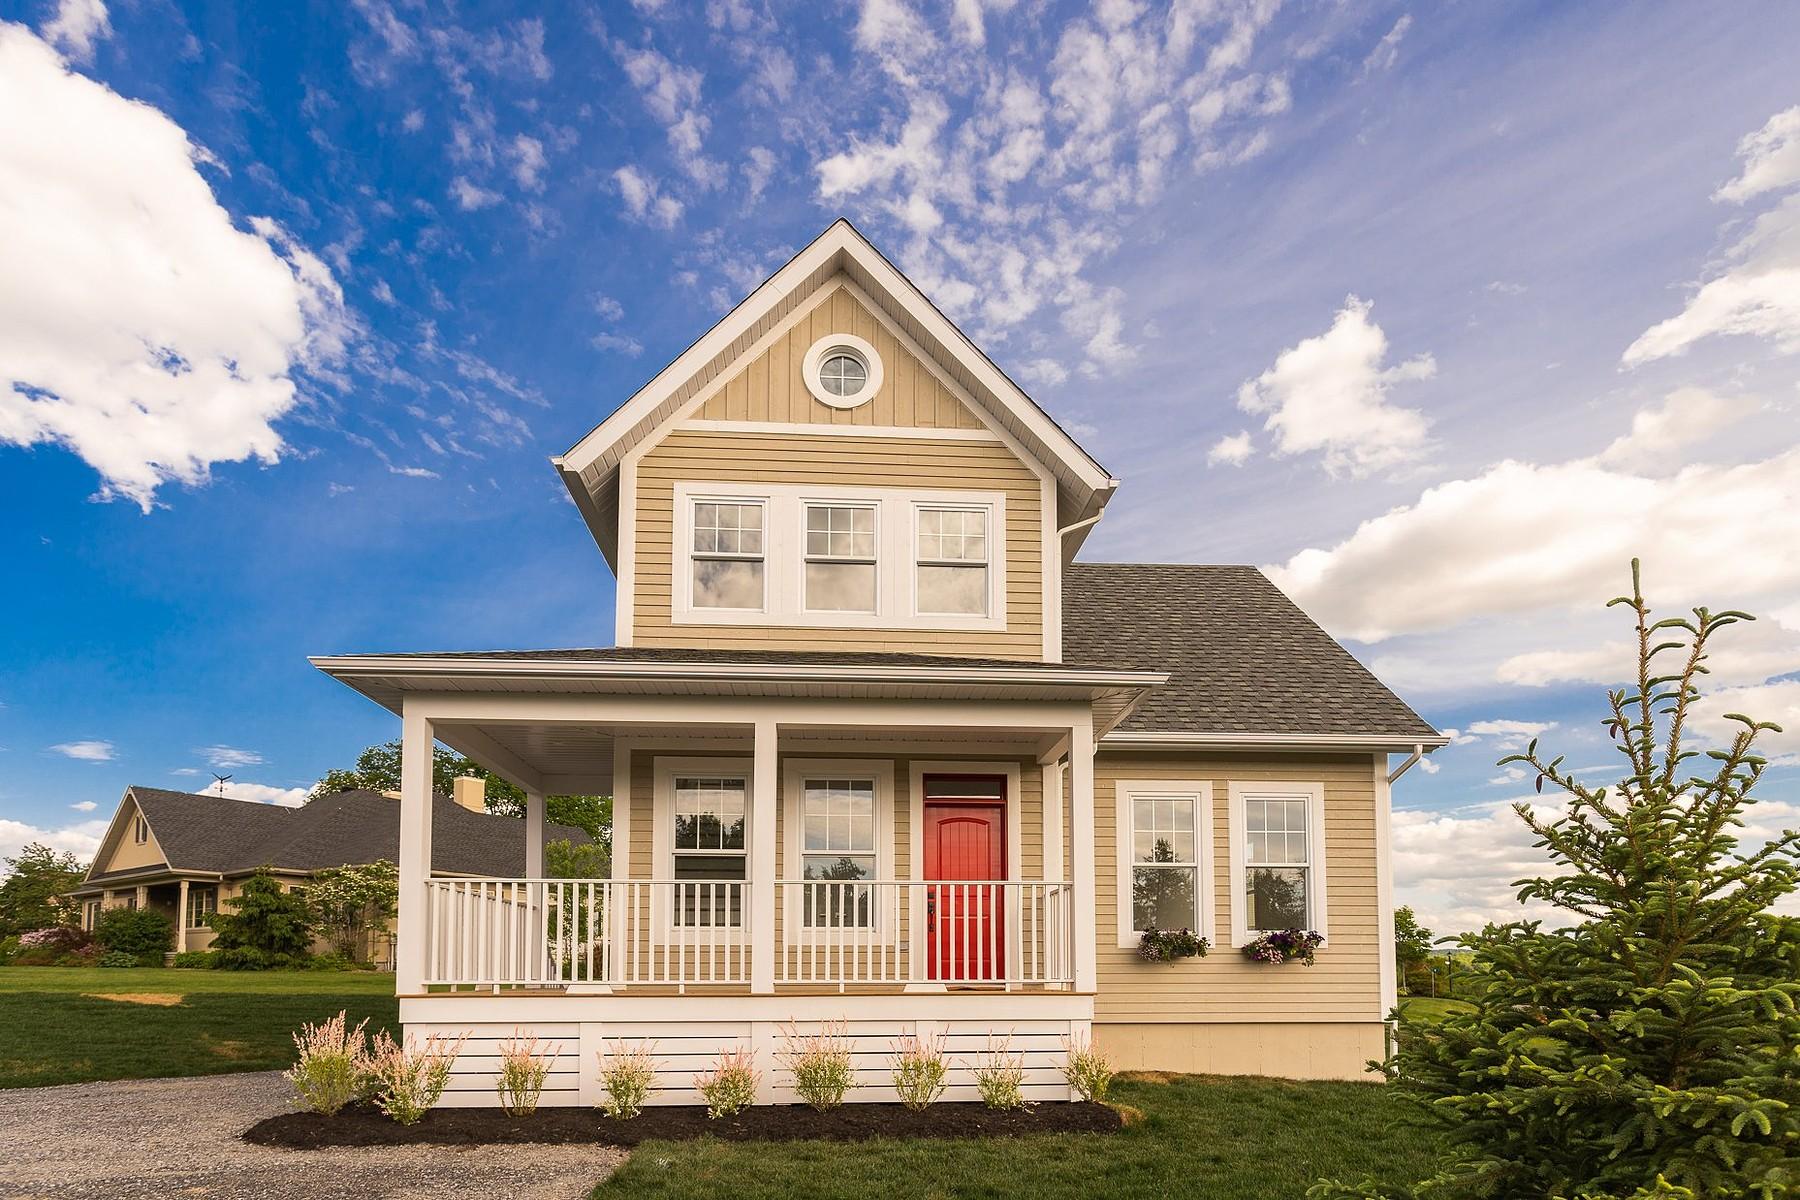 Single Family Homes for Sale at Lac-Brome, Montérégie 38 Rue Stone Haven Lac-Brome, Quebec J0E1S0 Canada